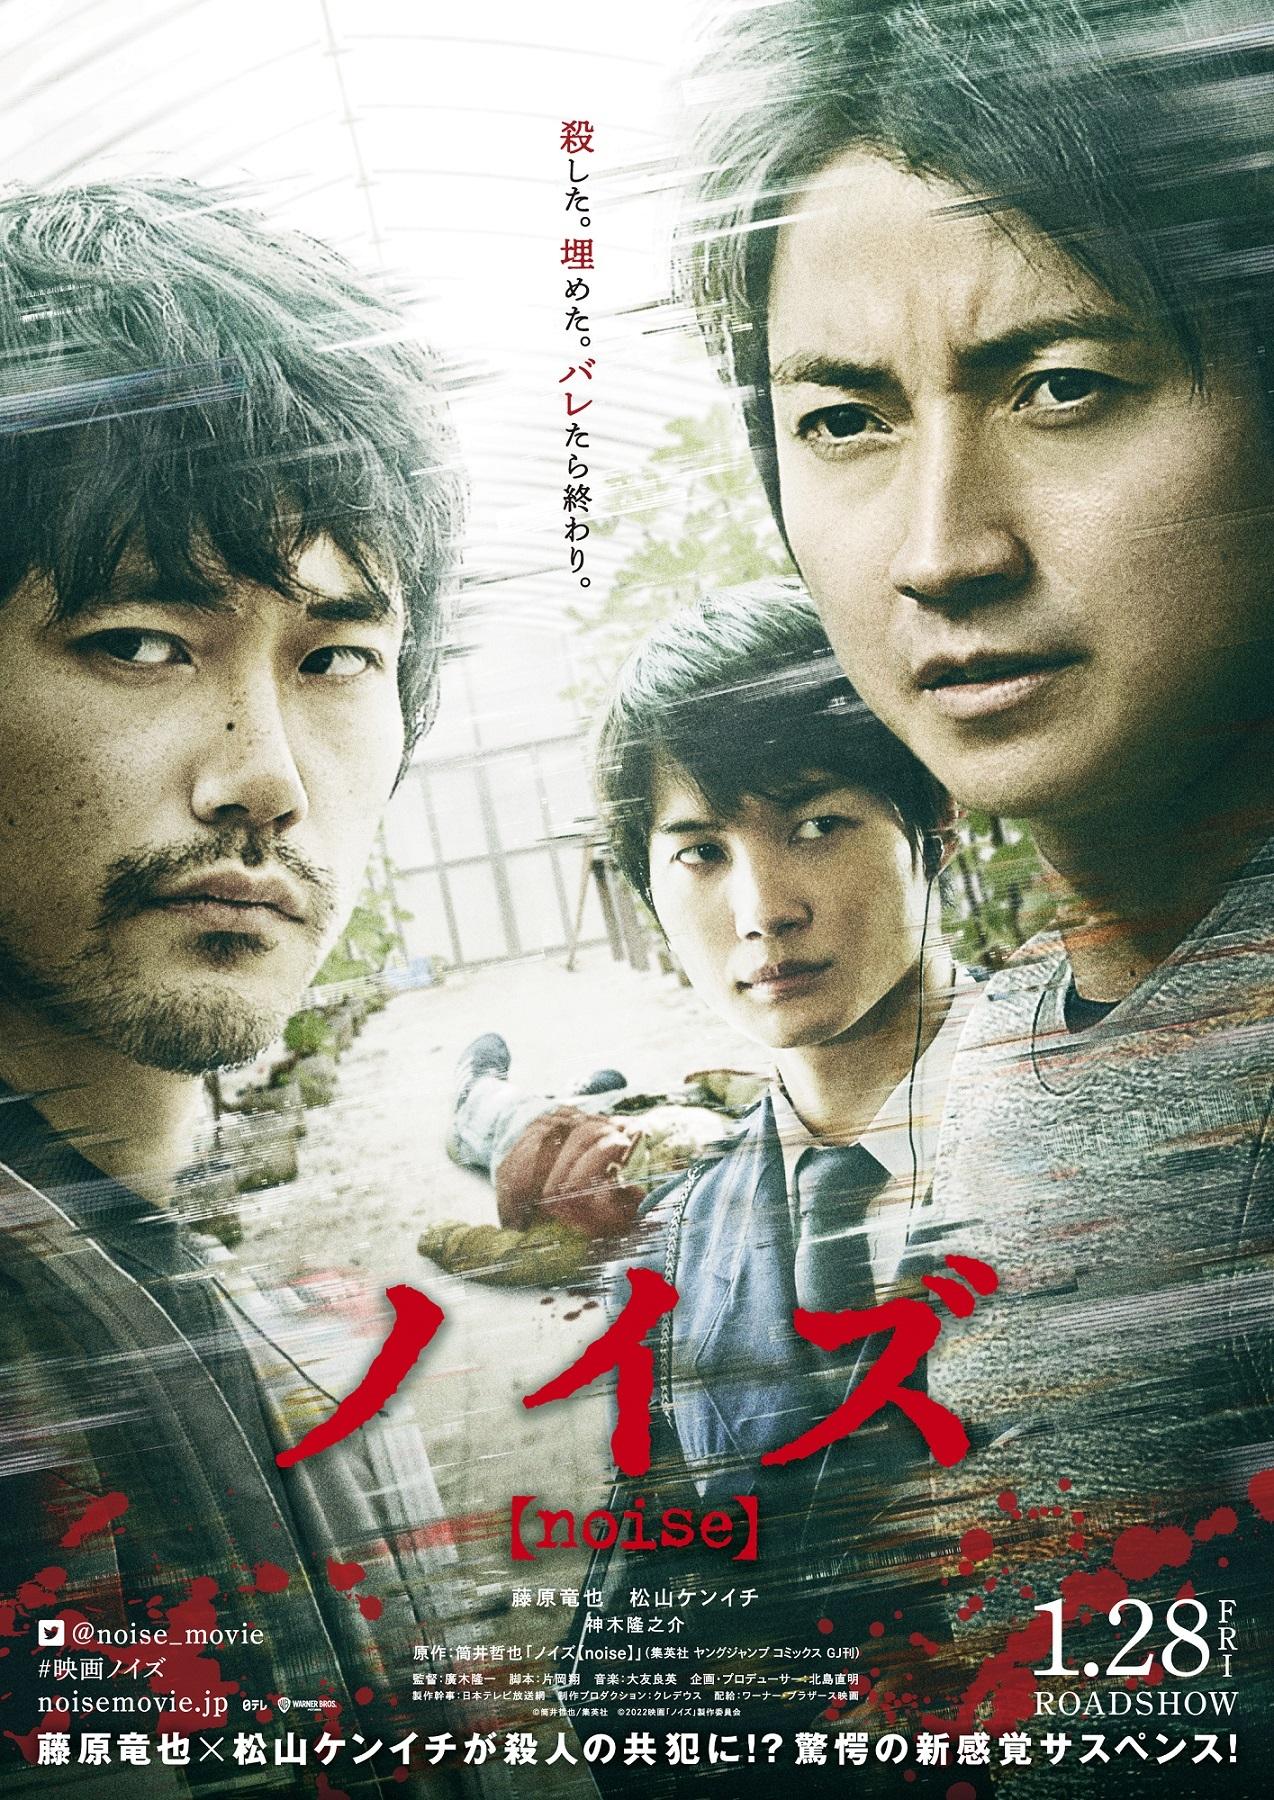 (C)筒井哲也/集英社(C)2022映画「ノイズ」製作委員会